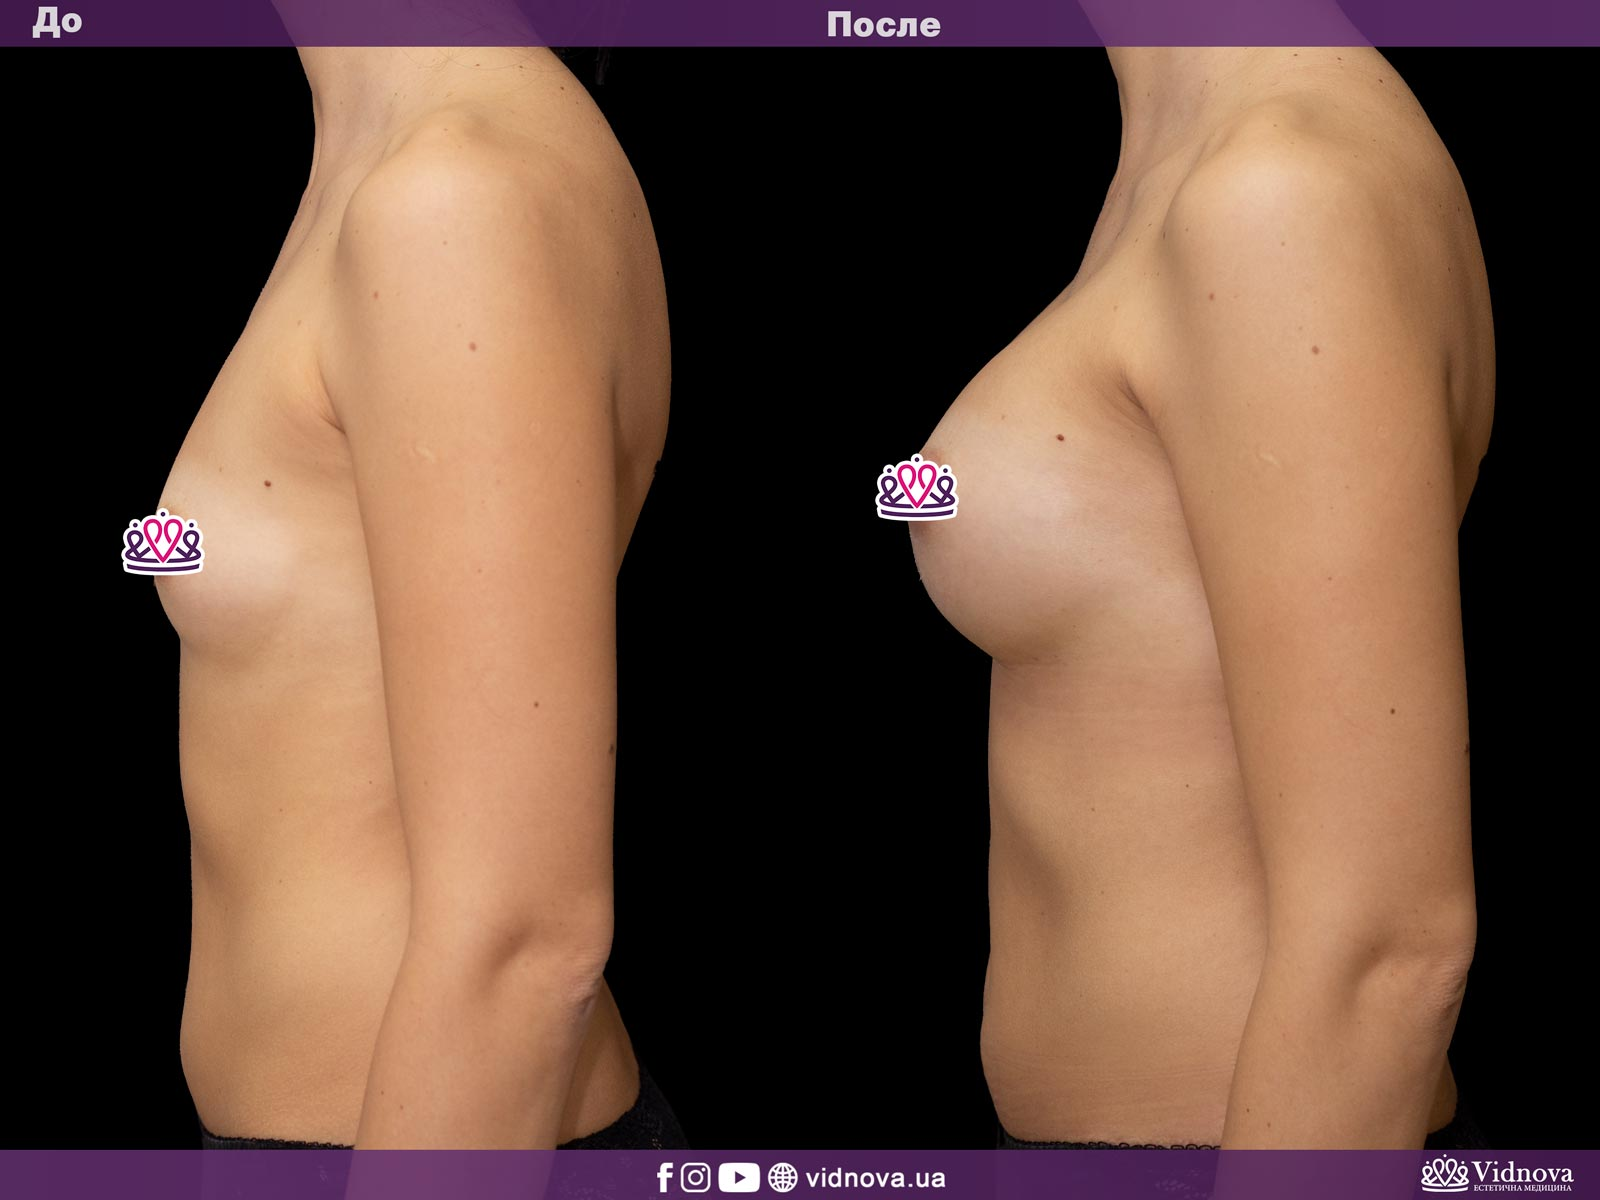 Увеличение груди: Фото ДО и ПОСЛЕ - Пример №21-3 - Клиника Vidnova